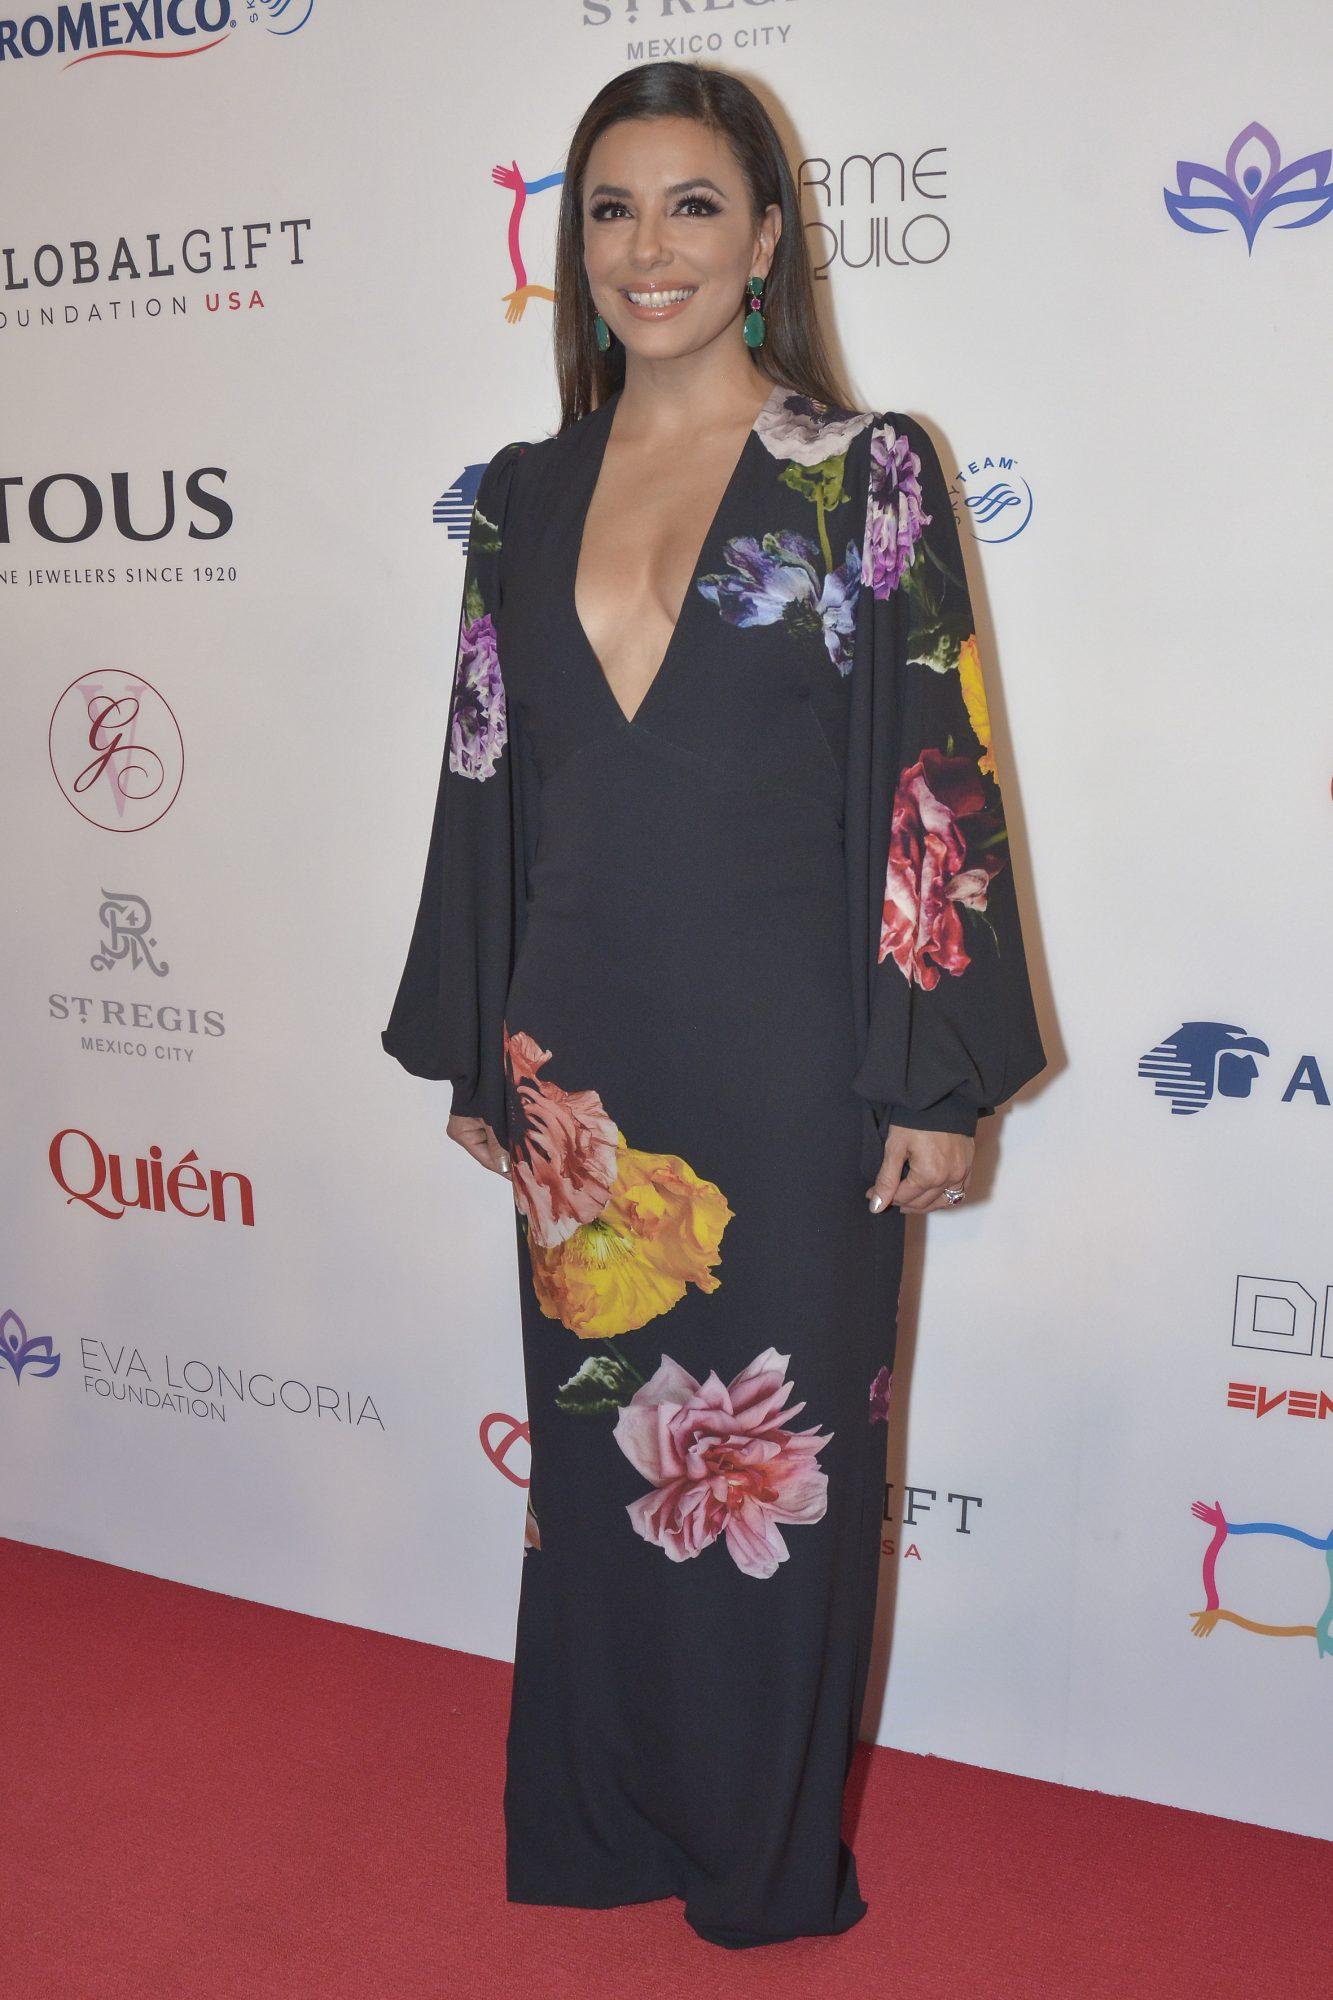 Eva Longoria, look, global gift gala, mexico